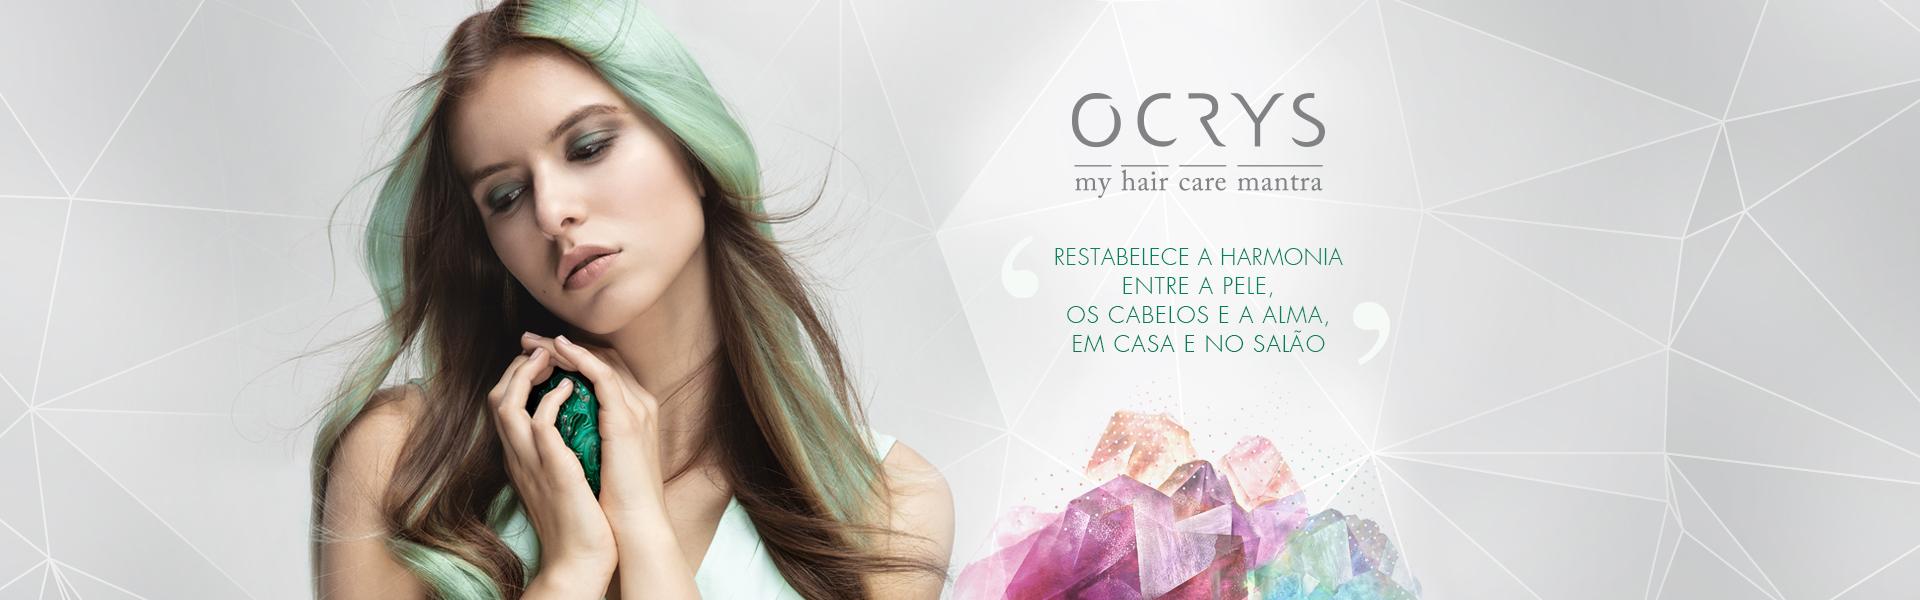 banner_centrali_OCRYS_PT